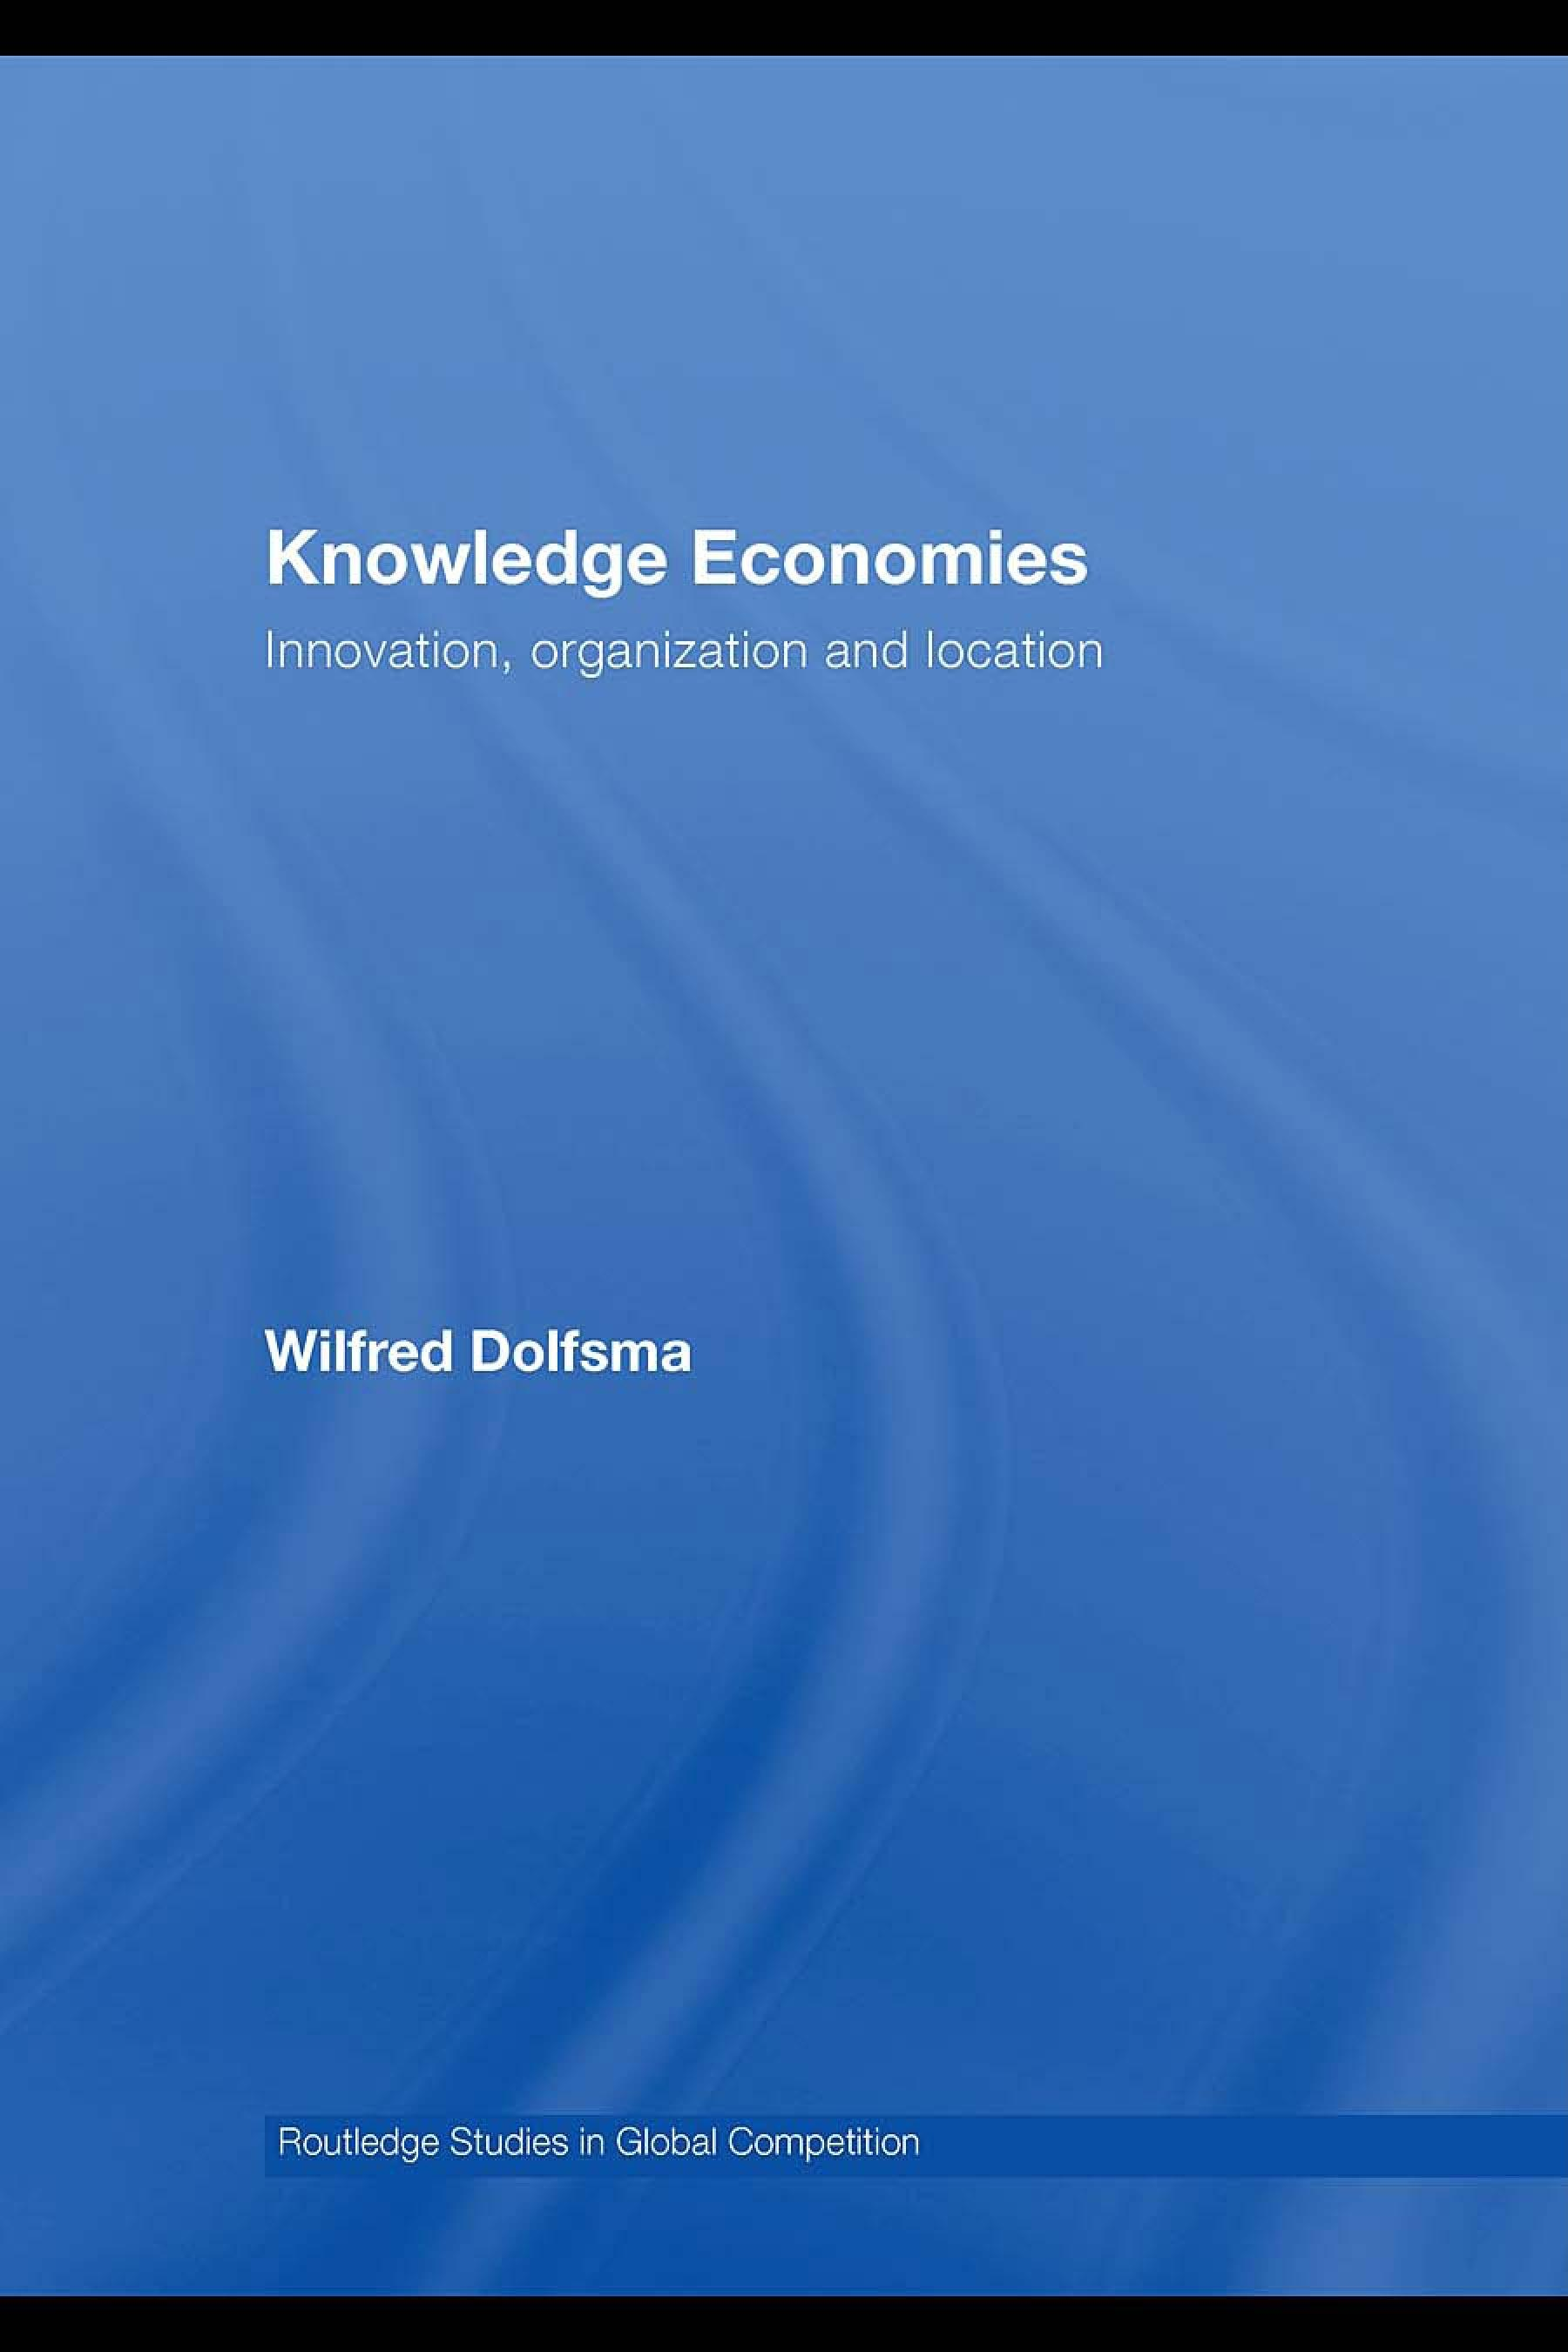 Knowledge Economies: Organization, location and innovation